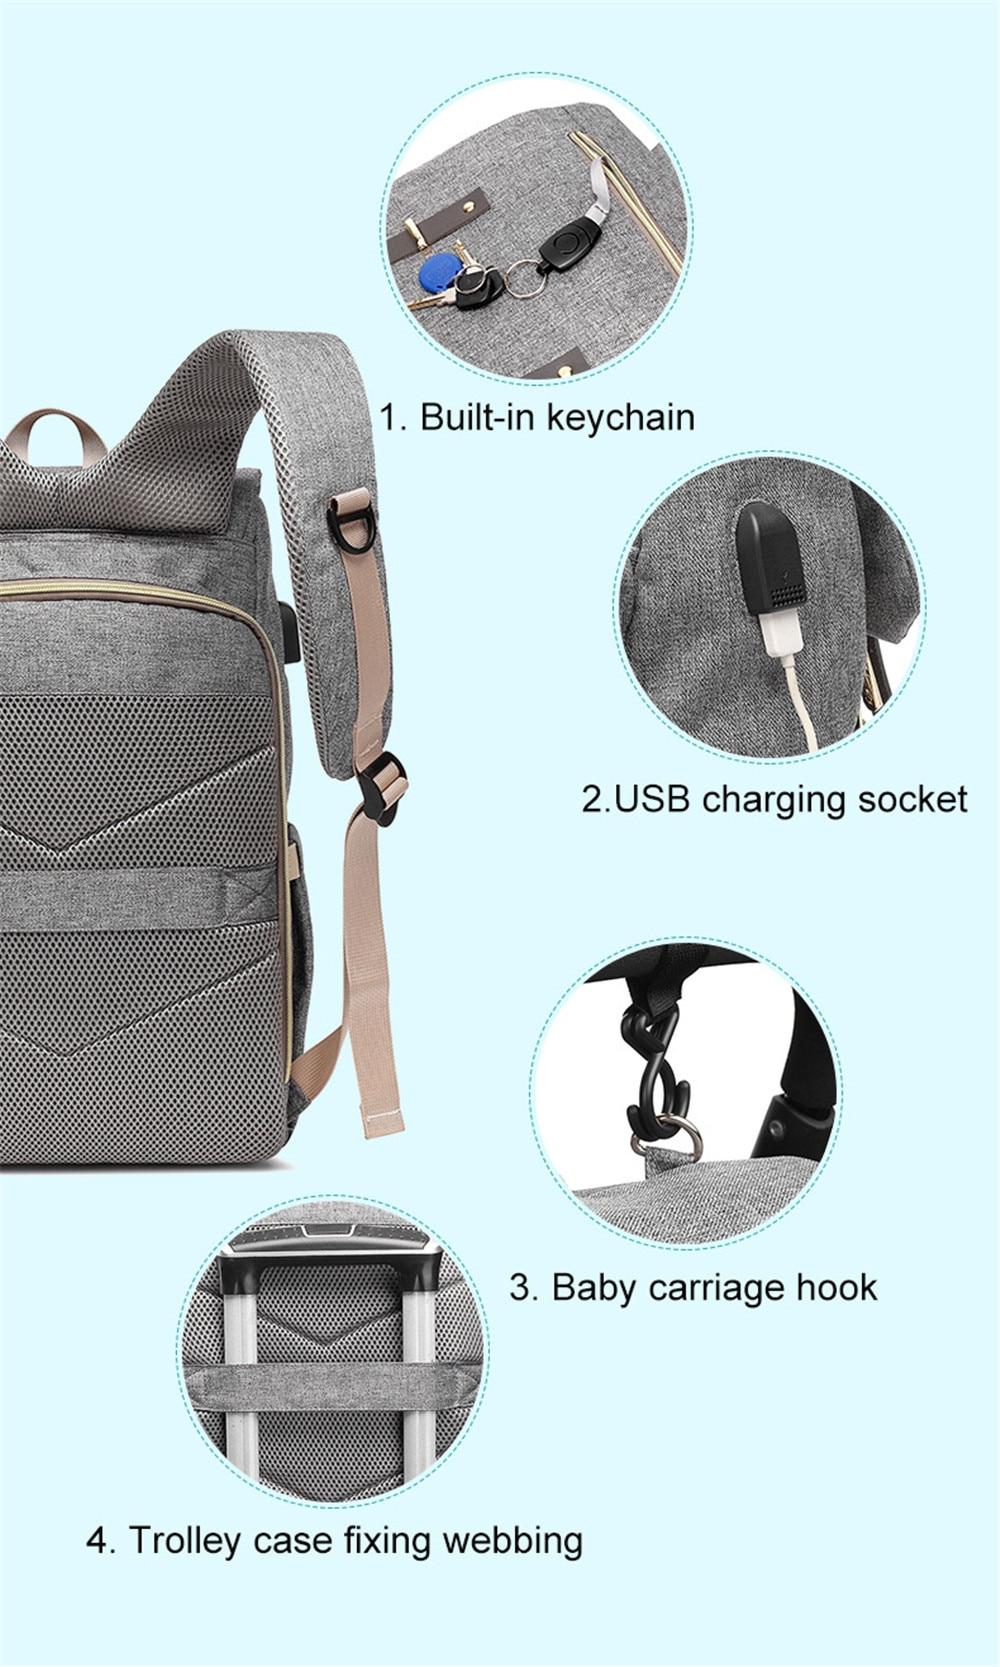 HTB1GhcnM9zqK1RjSZFLq6An2XXaJ Fashion Large Capacity Baby Nappy Bag Diaper Bag Purse Multifunction USB Mummy Travel Backpack Women Nursing Bags For Mom Daddy